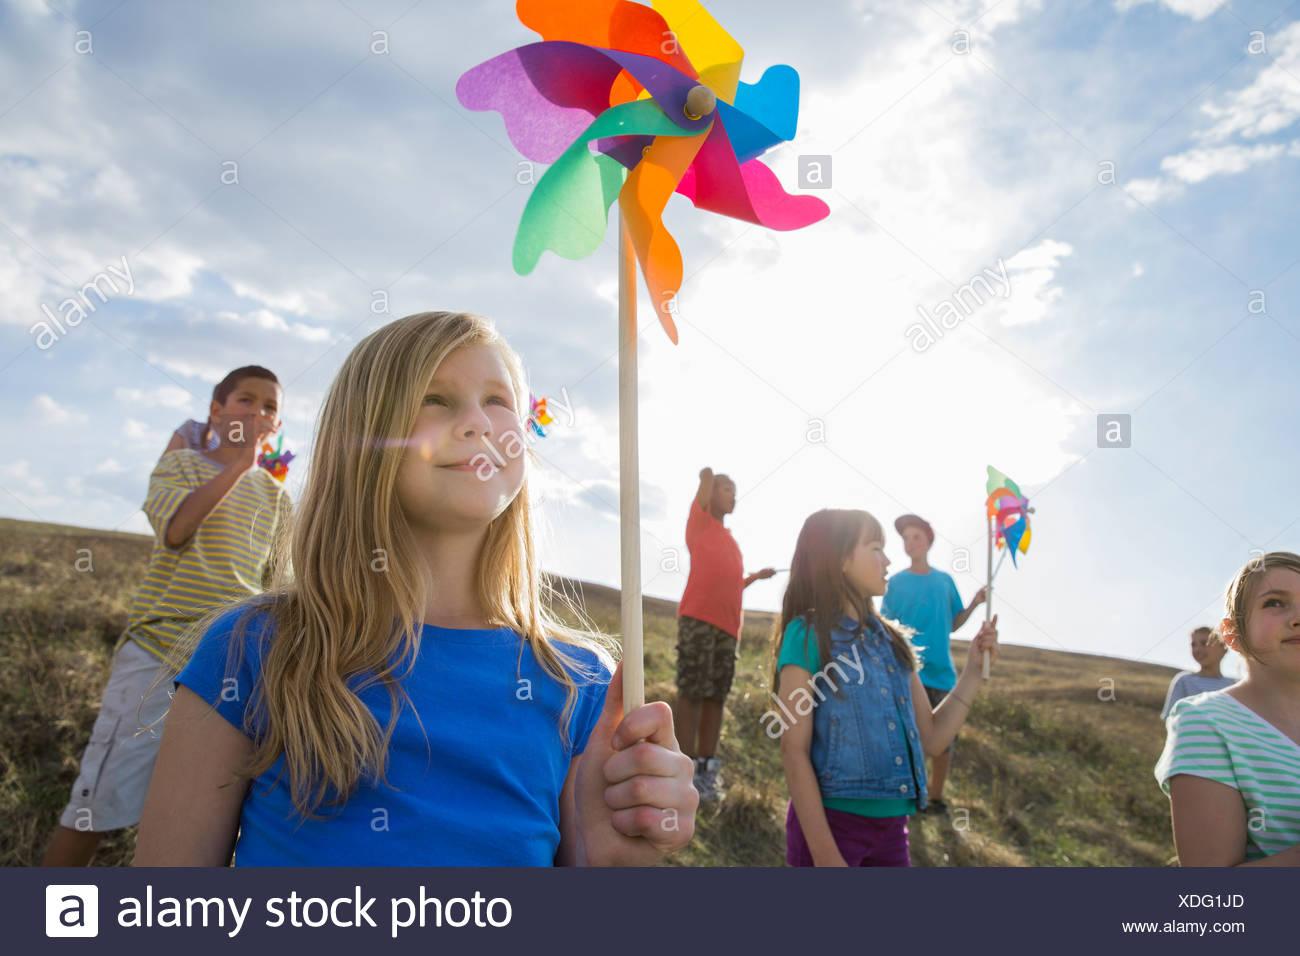 Smiling schoolchildren holding pinwheels outdoors - Stock Image